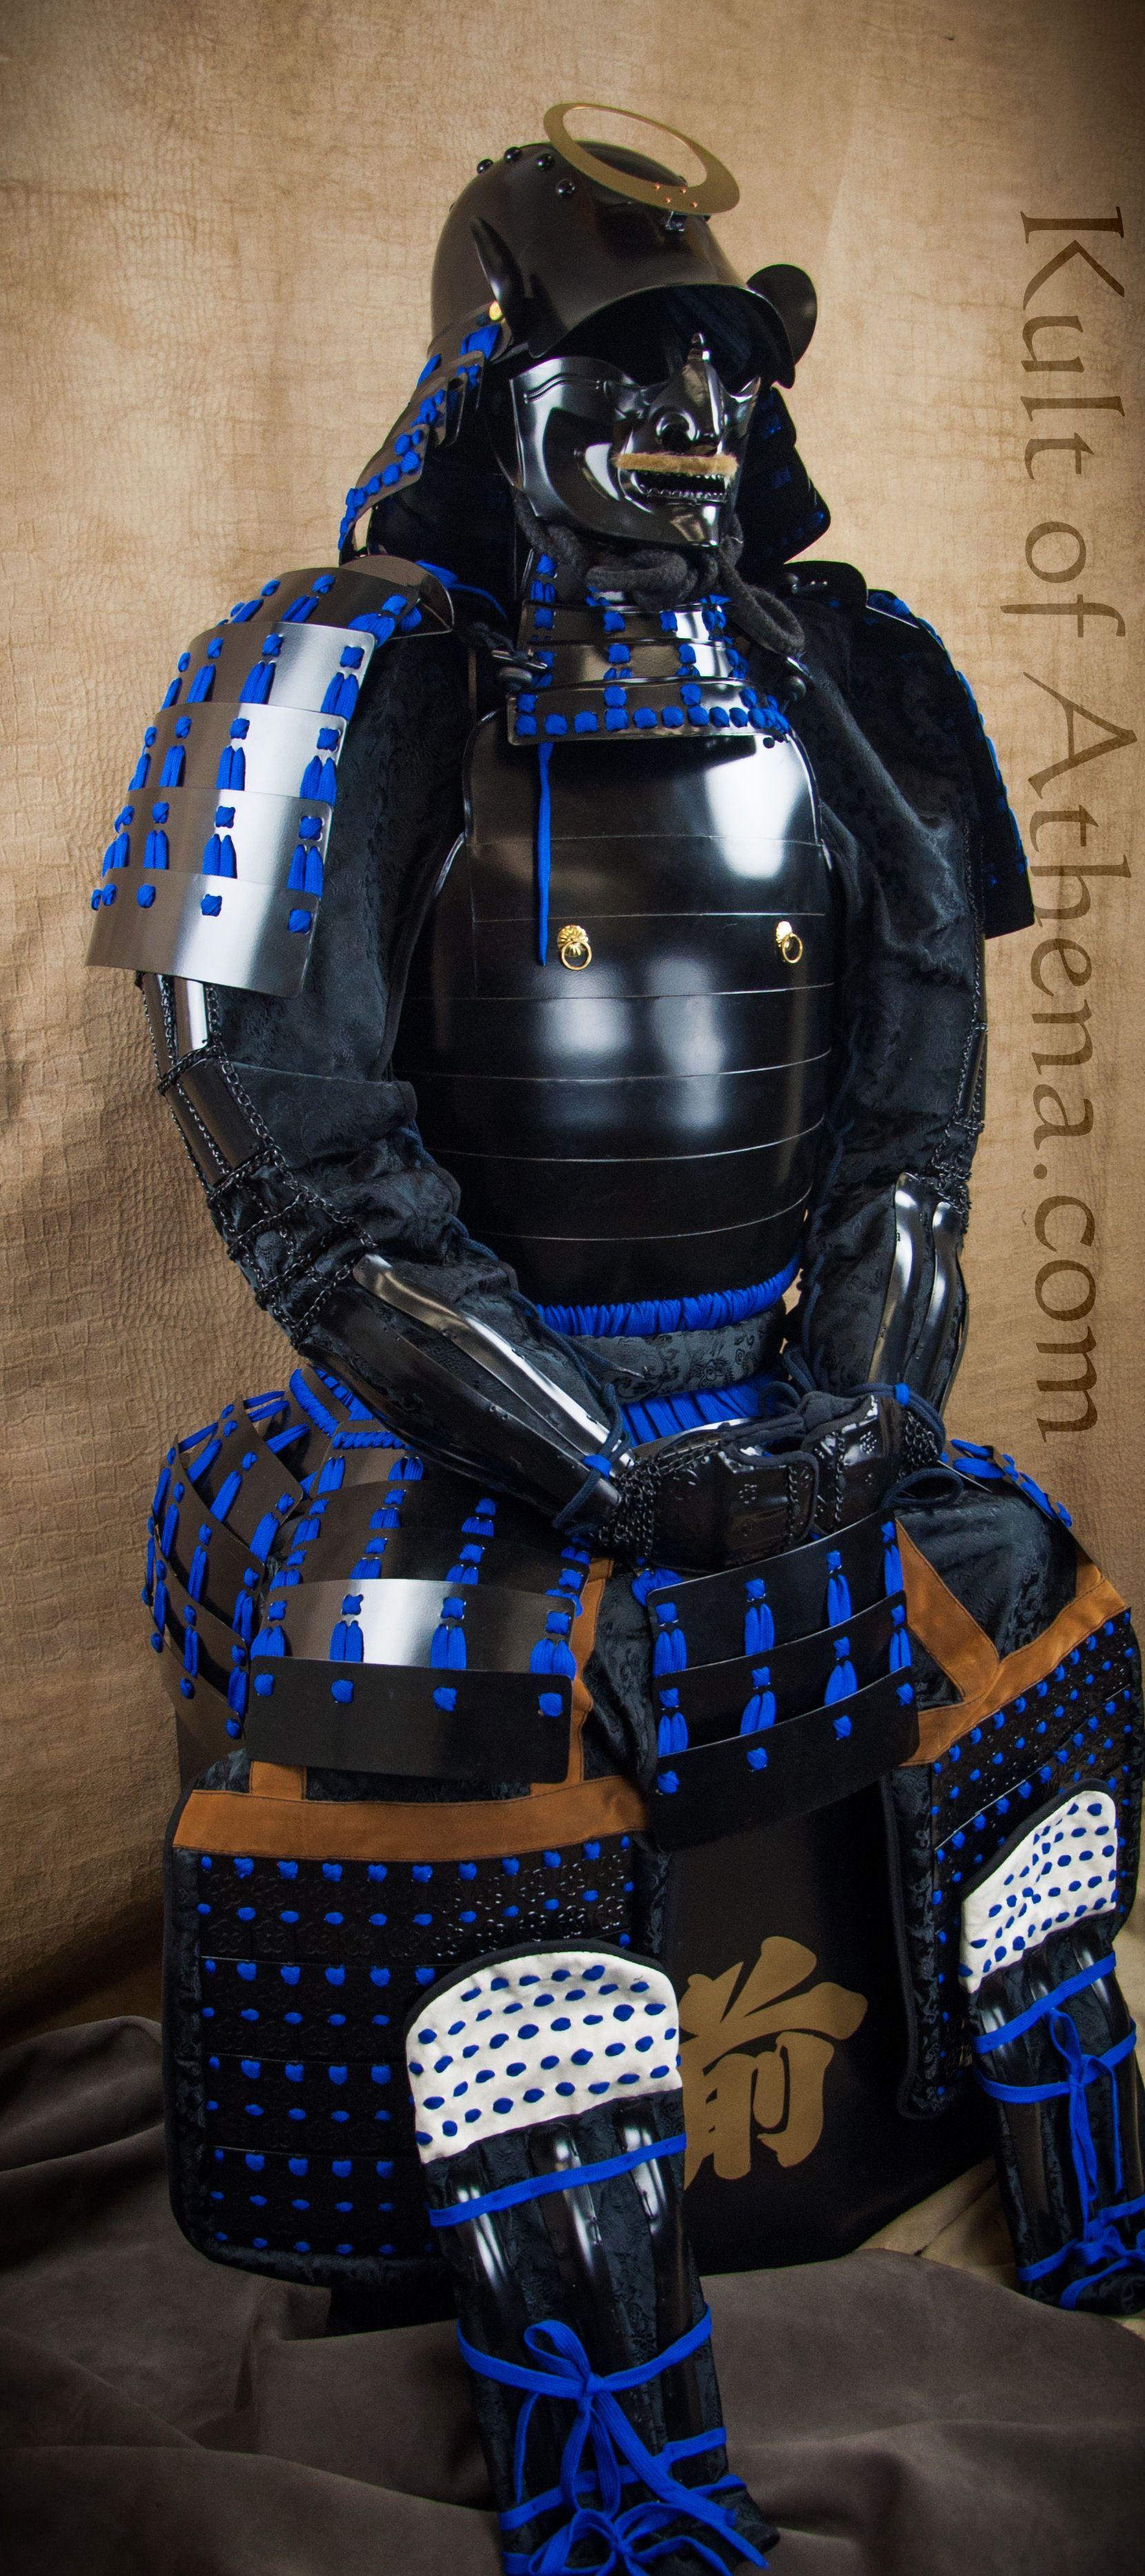 Samurai Armor Set Okegawa Samurai Samurai armor